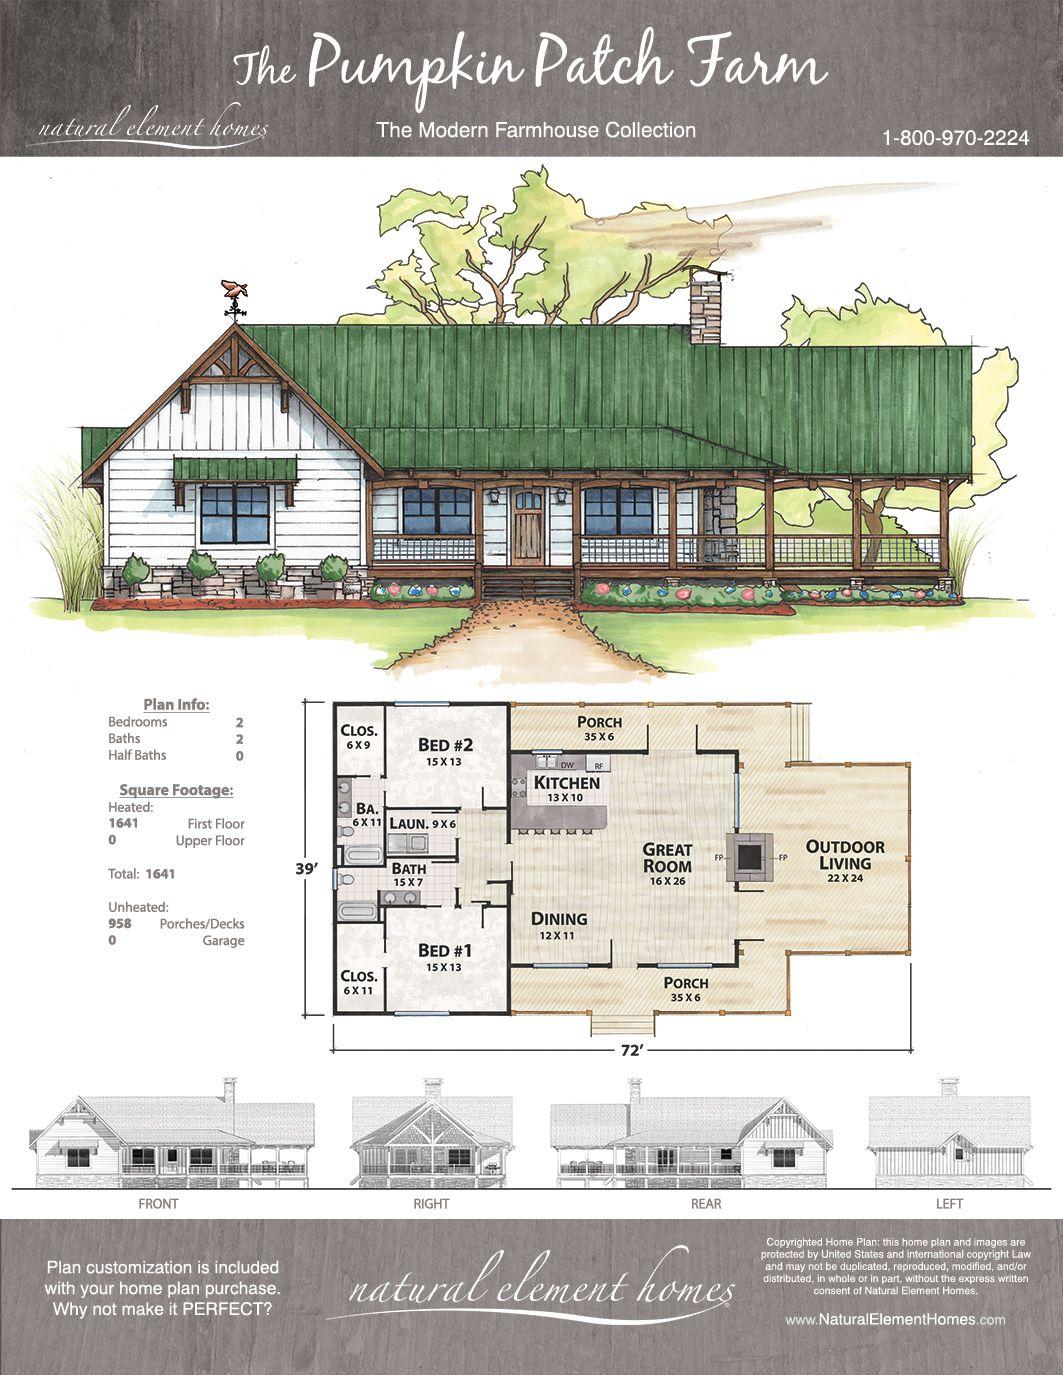 Pumpkin Patch Farm Natural Element Homes Modern Farmhouse Dream House Plans Building A House Farmhouse Plans